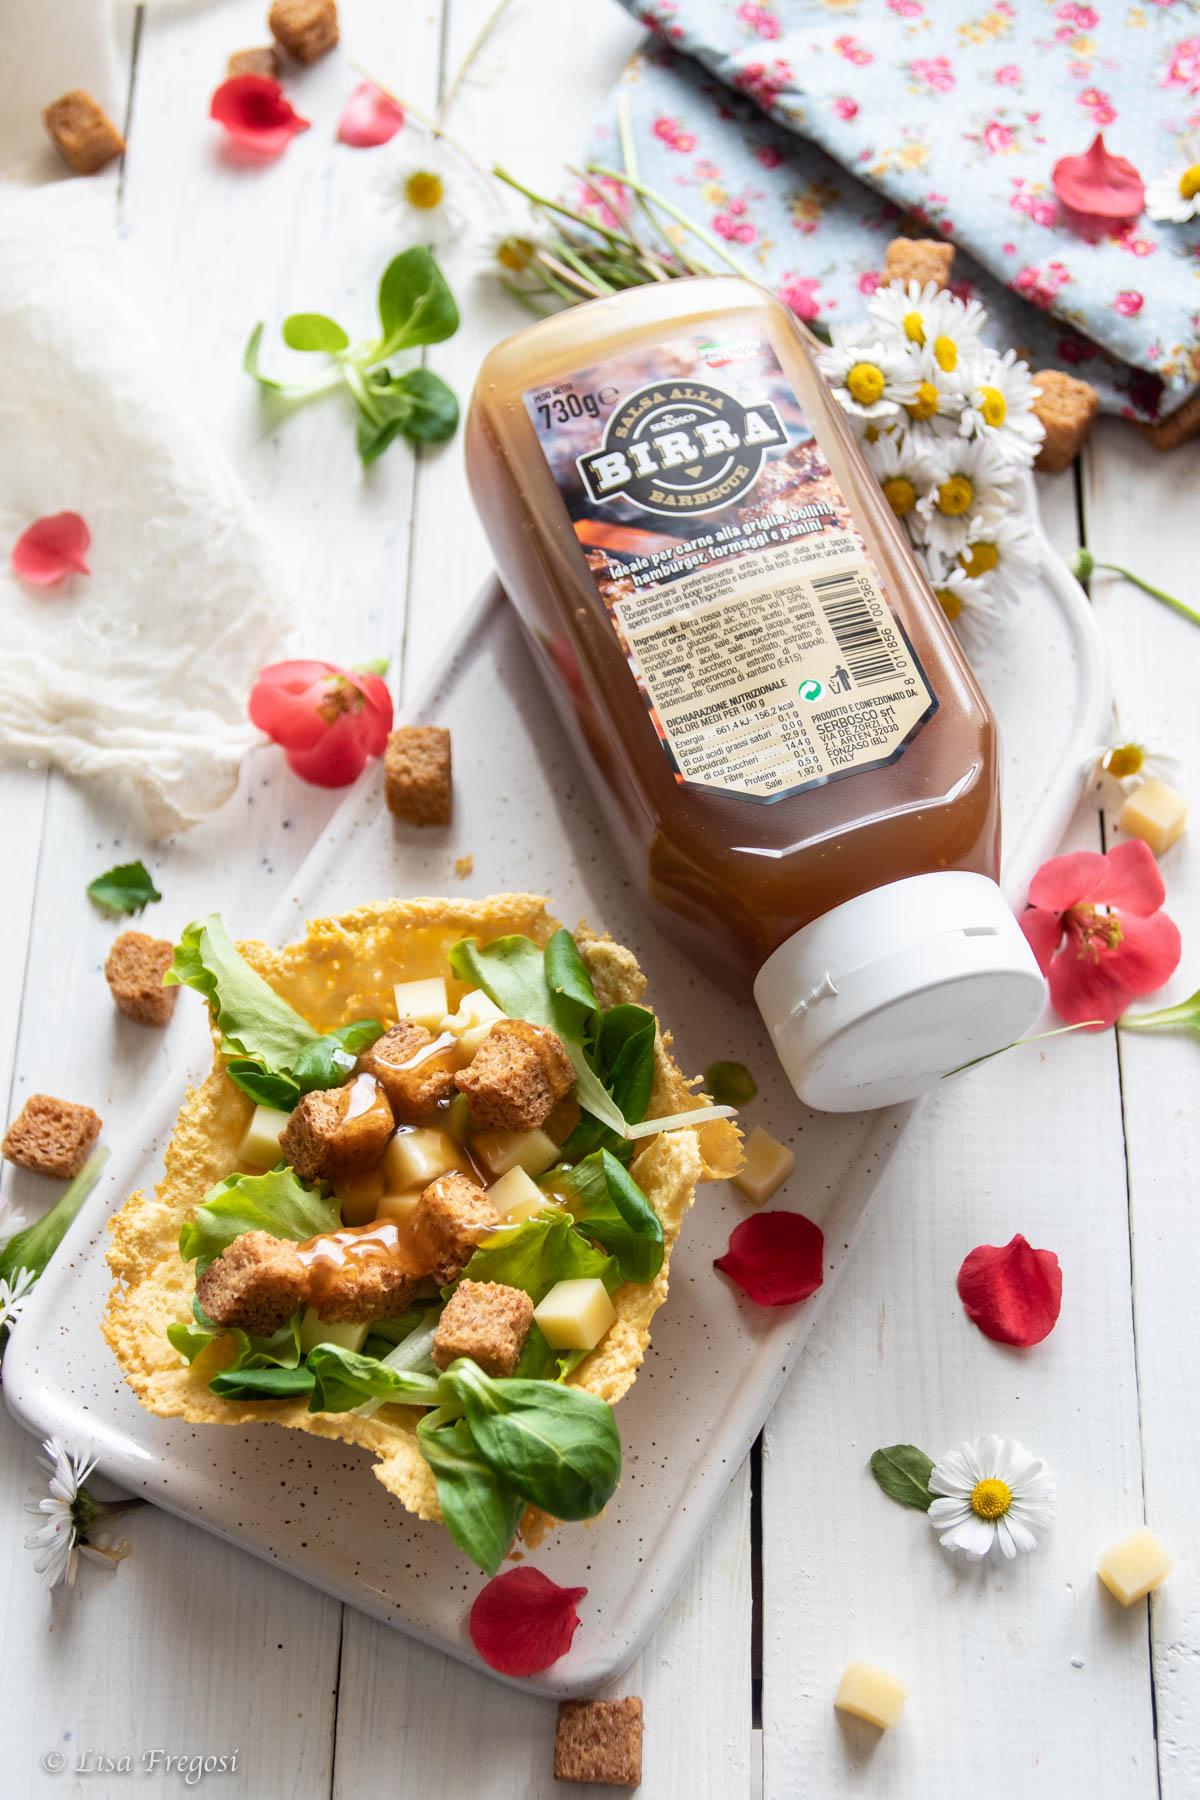 caesar salad salsa birra serbosco